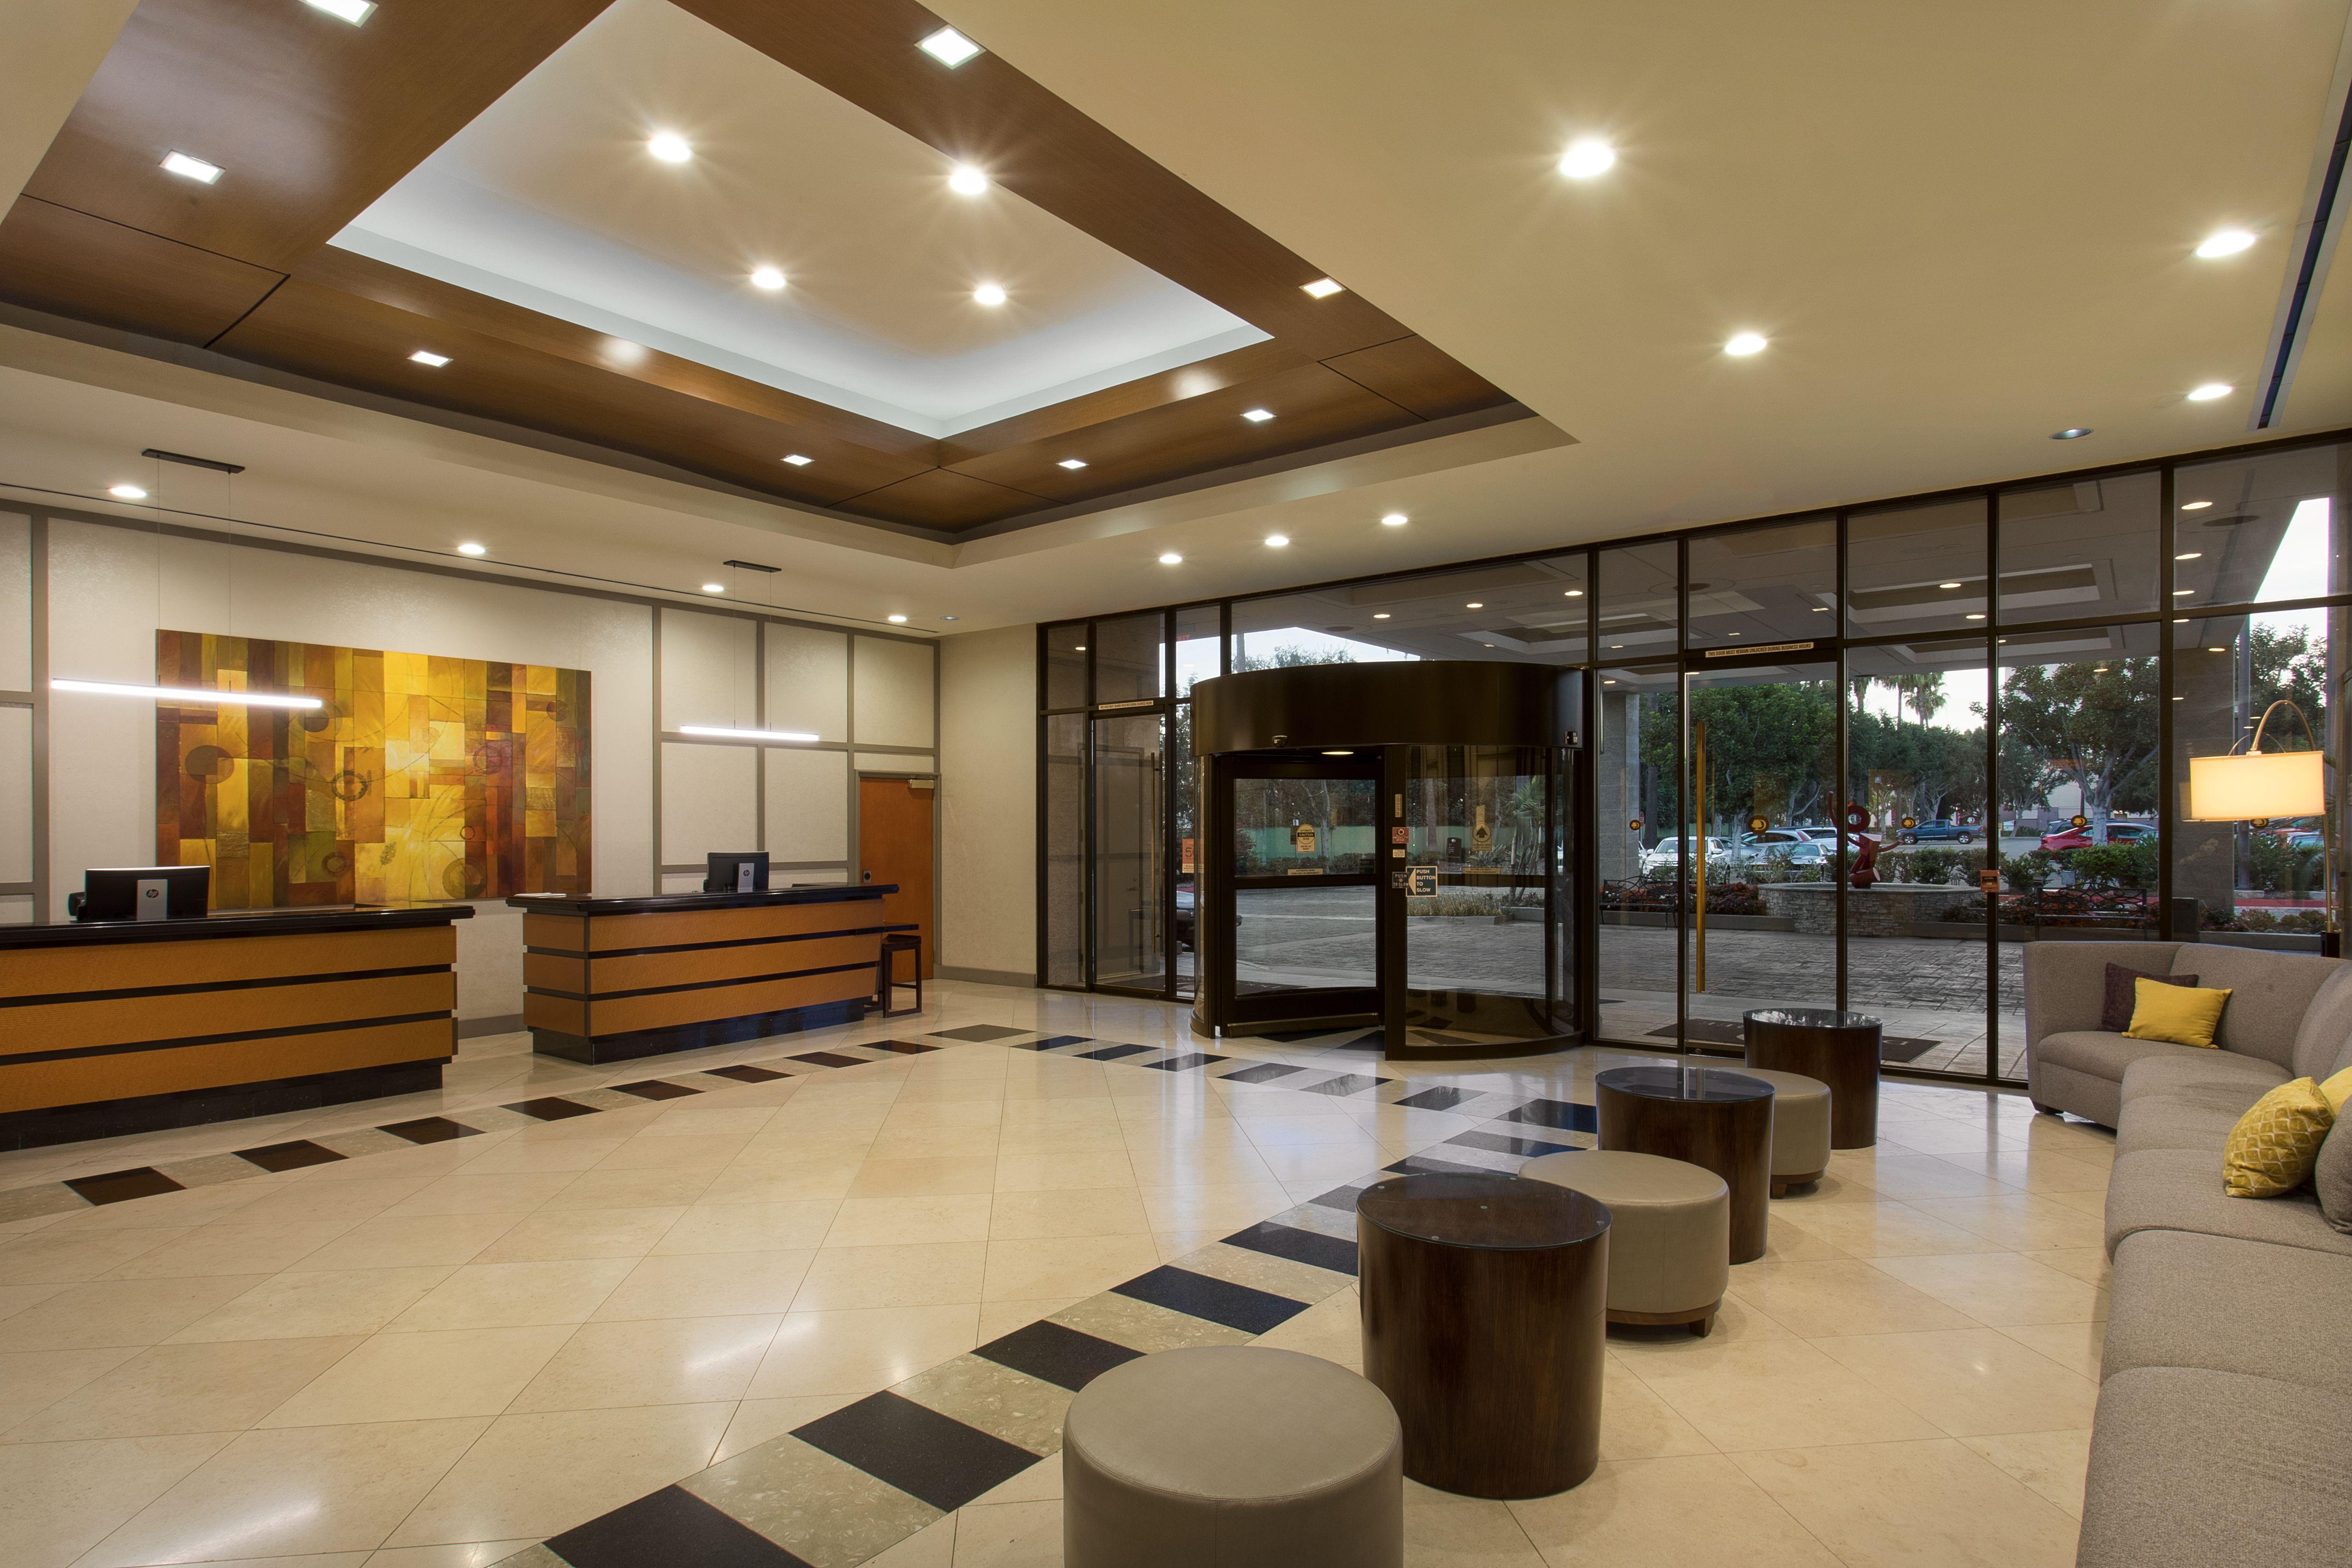 doubletree by hilton hotel los angeles norwalk in. Black Bedroom Furniture Sets. Home Design Ideas